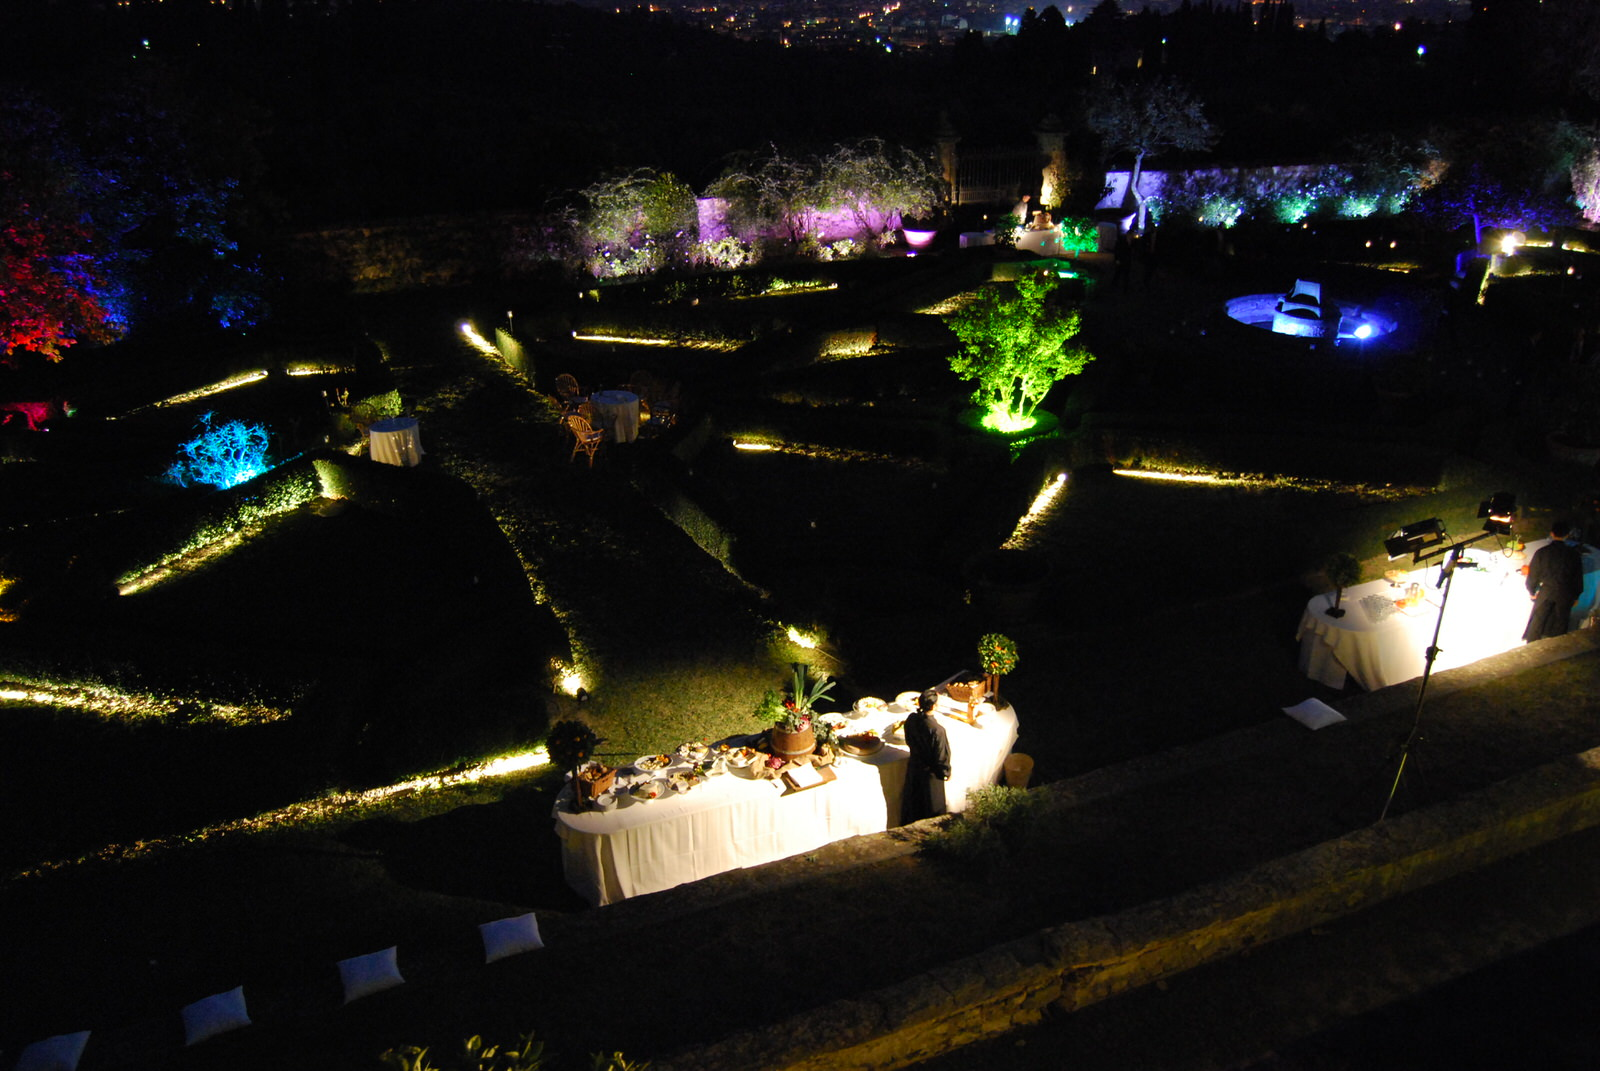 tuscany-wedding-planners-lightsound-02.jpg